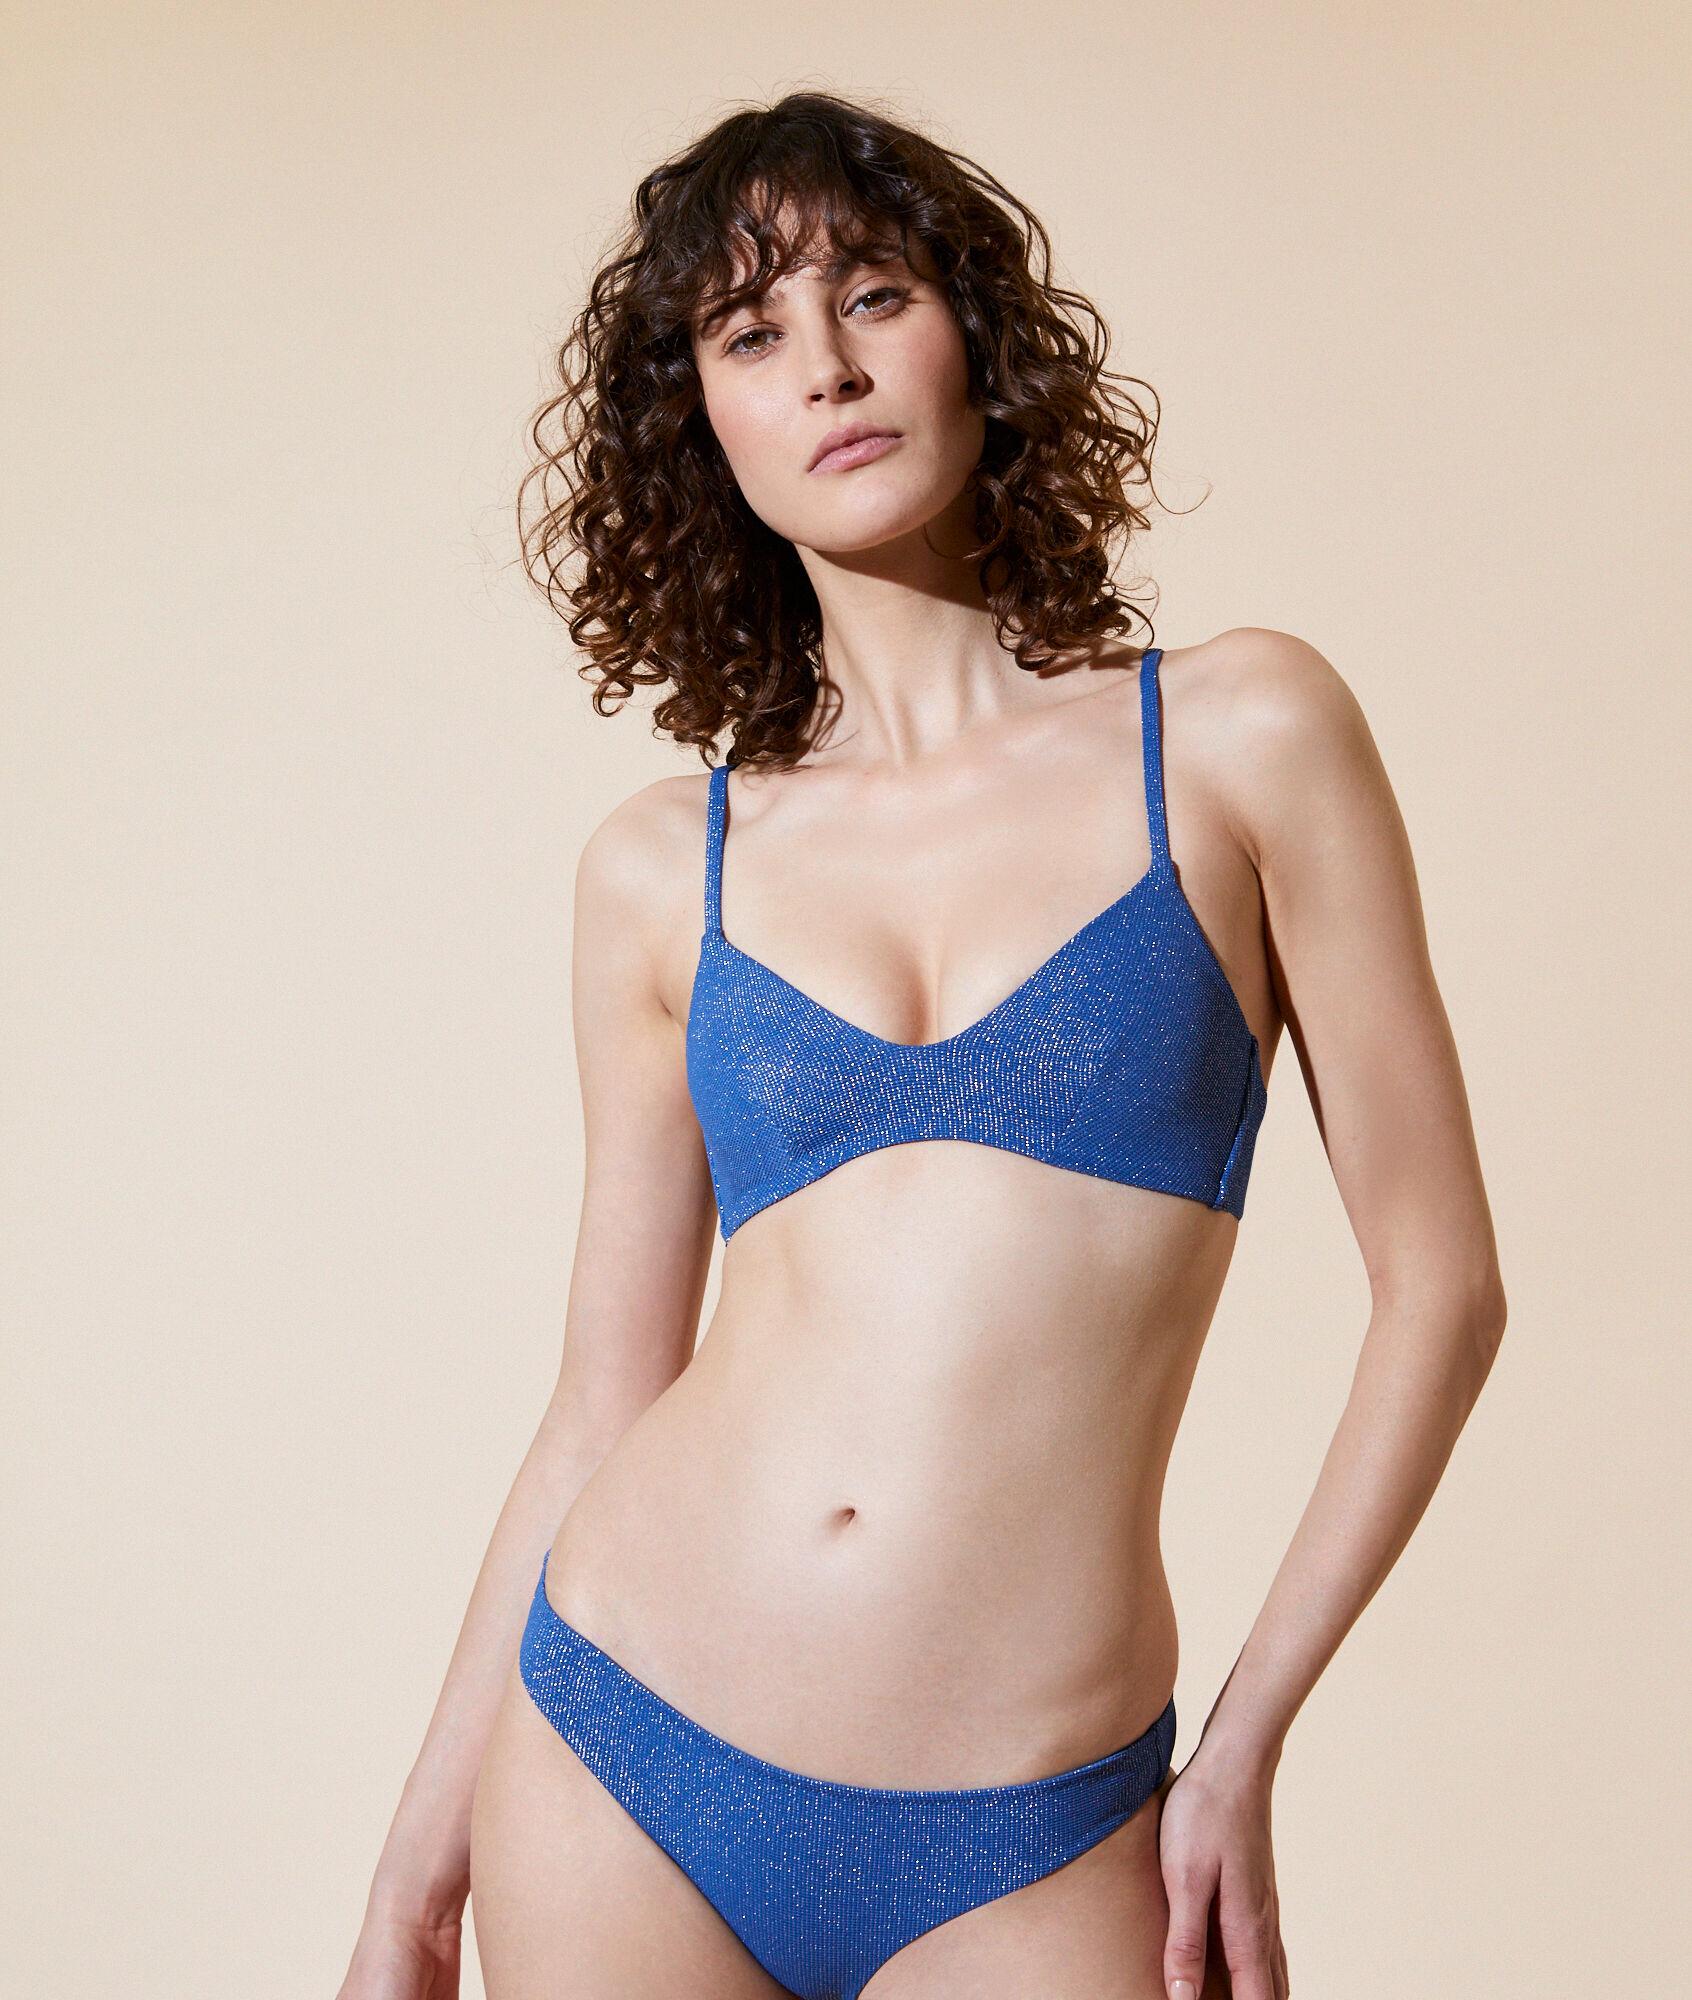 Haut de maillot de bain triangle, pads amovibles BLEU ETAM